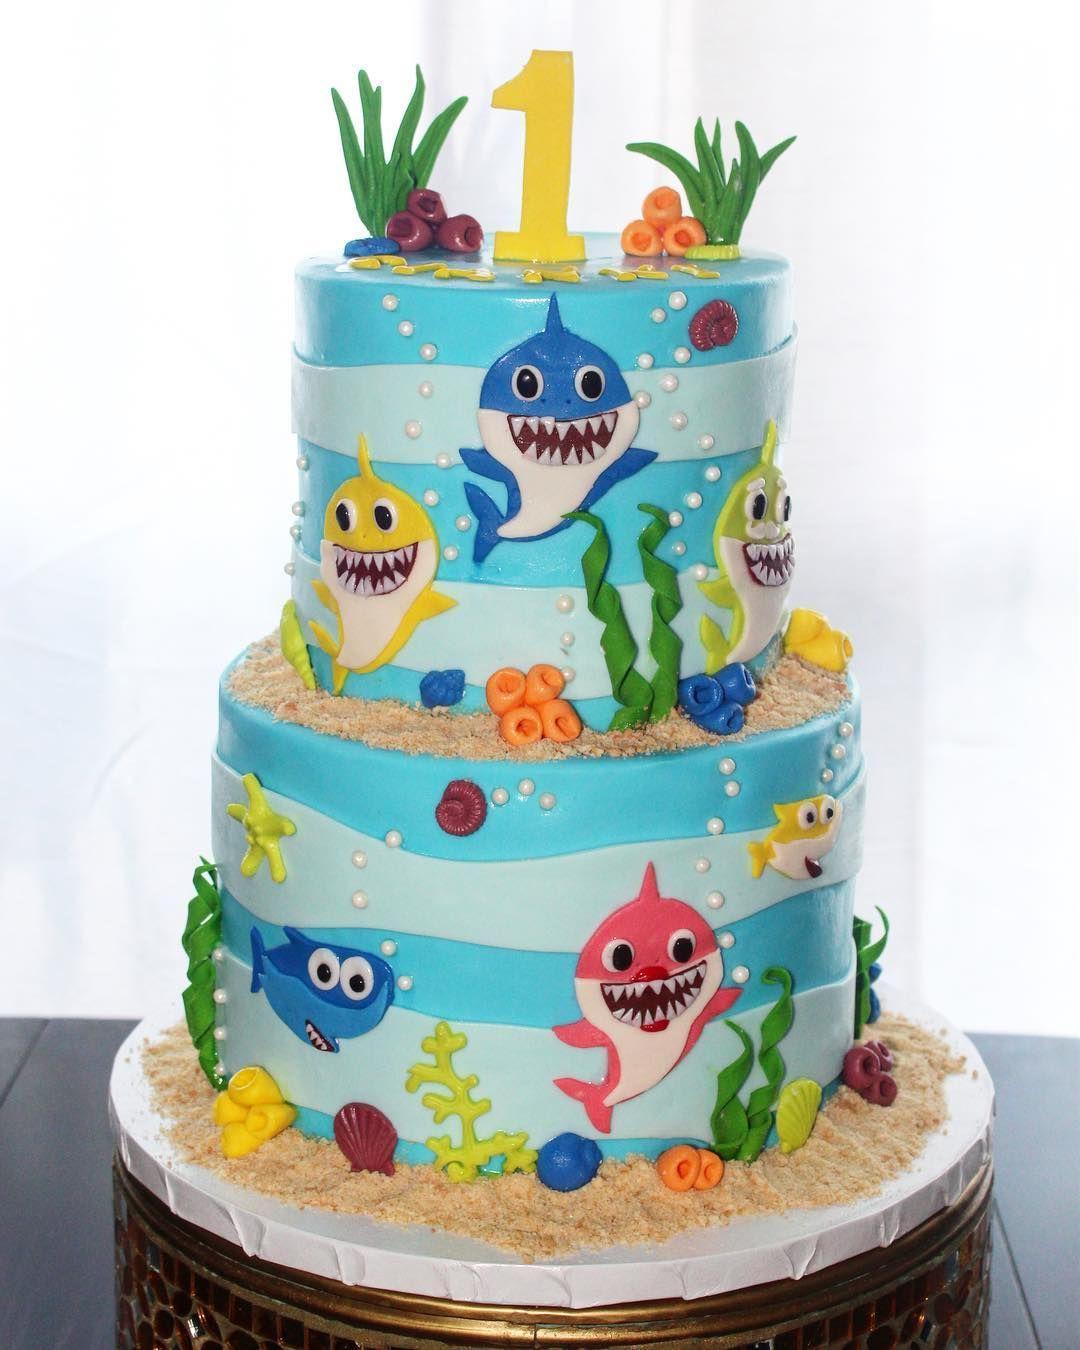 Tiff On Instagram ʙᴀʙʏ Sʜᴀʀᴋ ᴄᴀᴋᴇ ᴛᴀɢ ʏᴏᴜʀ ғʀɪᴇɴᴅs Baby First Birthday Cake Boys First Birthday Cake Boy Birthday Cake